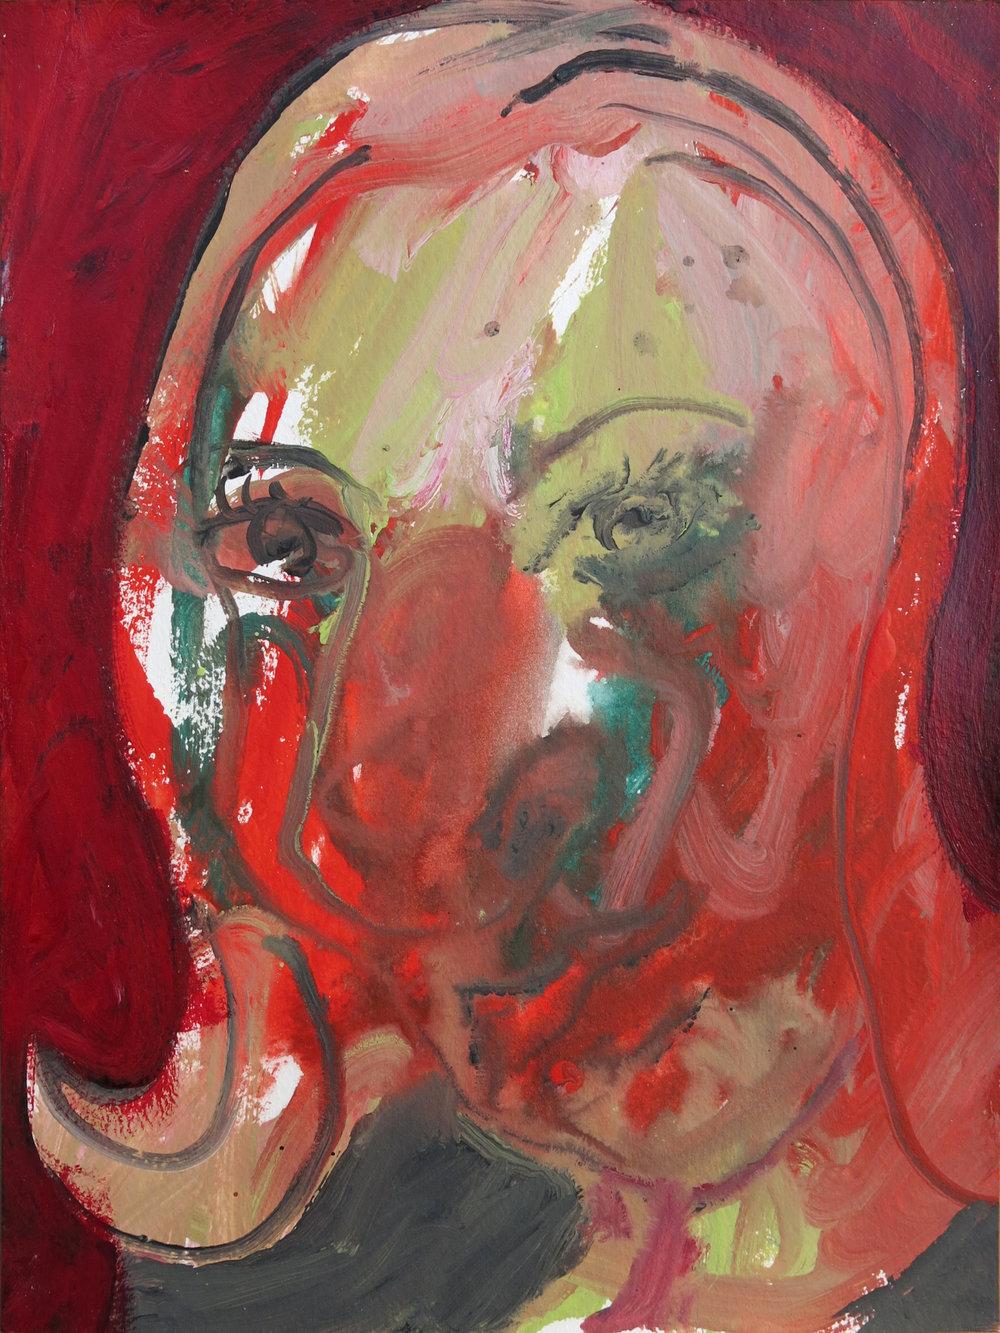 Barbra Streisand Portrait #66